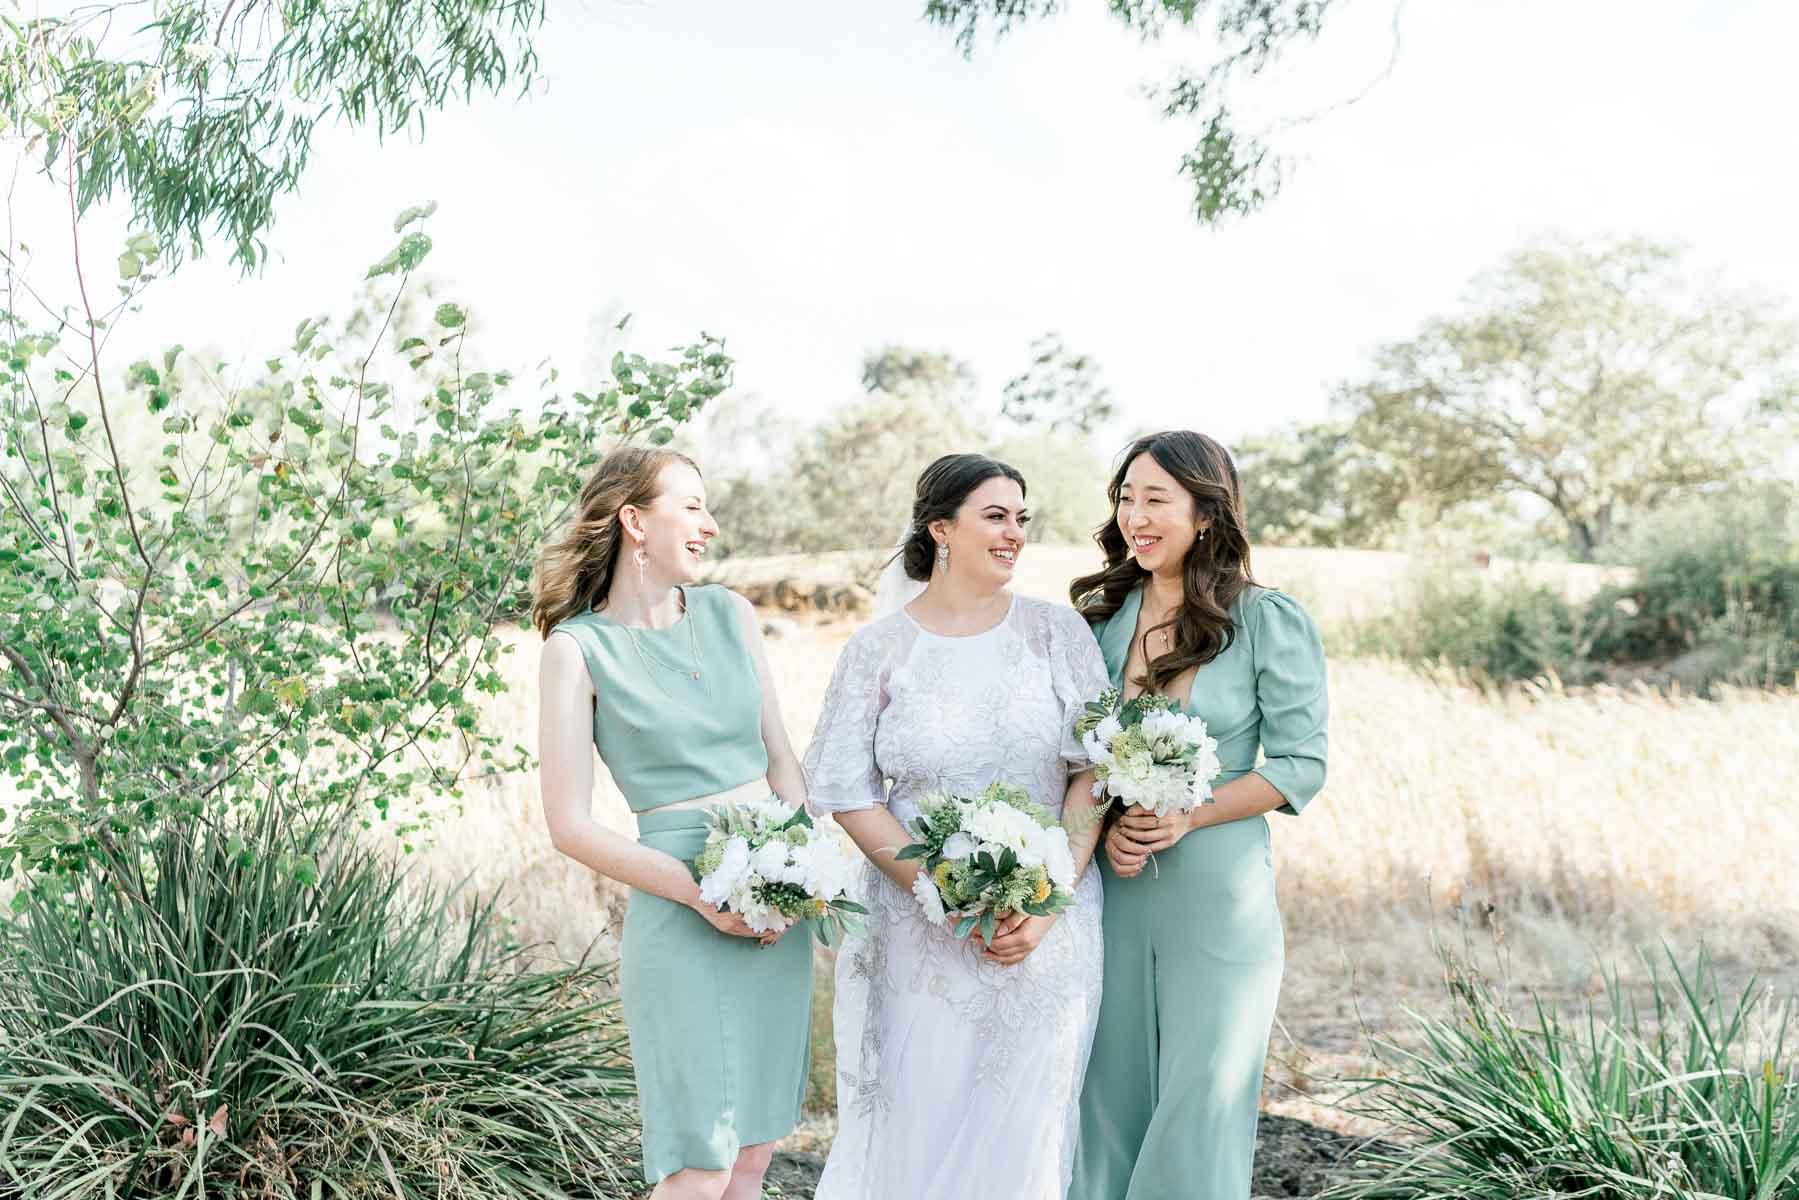 little-henri-cafe-wedding-thornbury-heart+soul-weddings-jane-aaron-05209.jpg